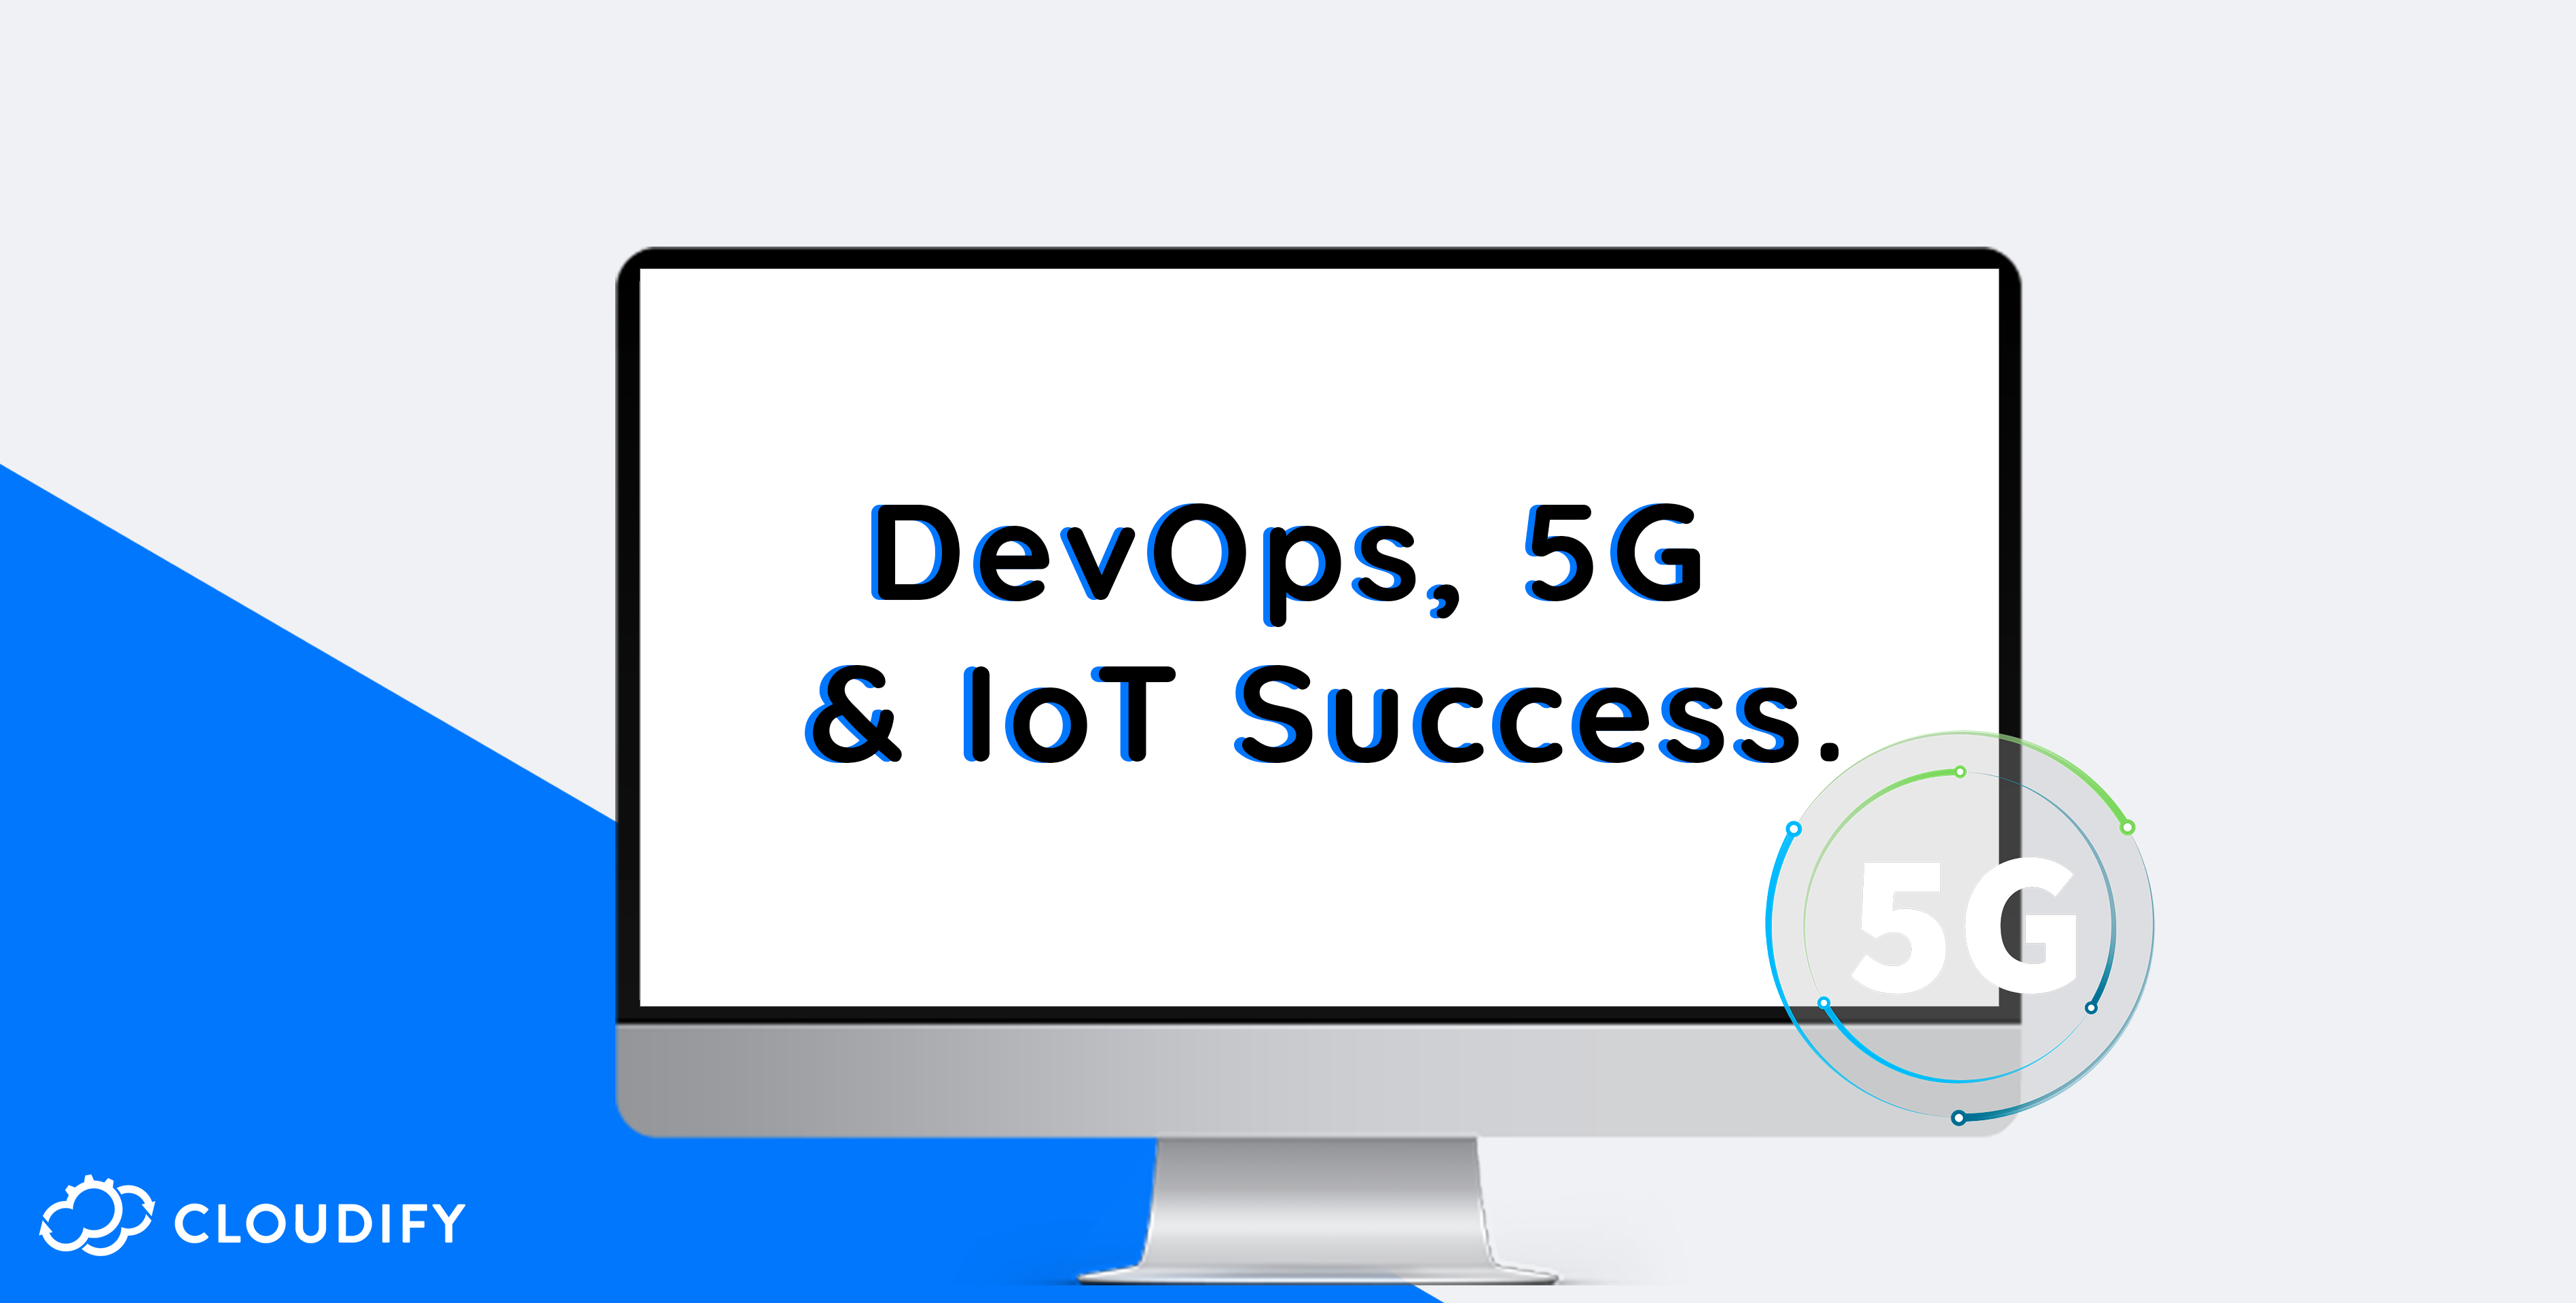 Cloudify 5G network slicing Devops IoT